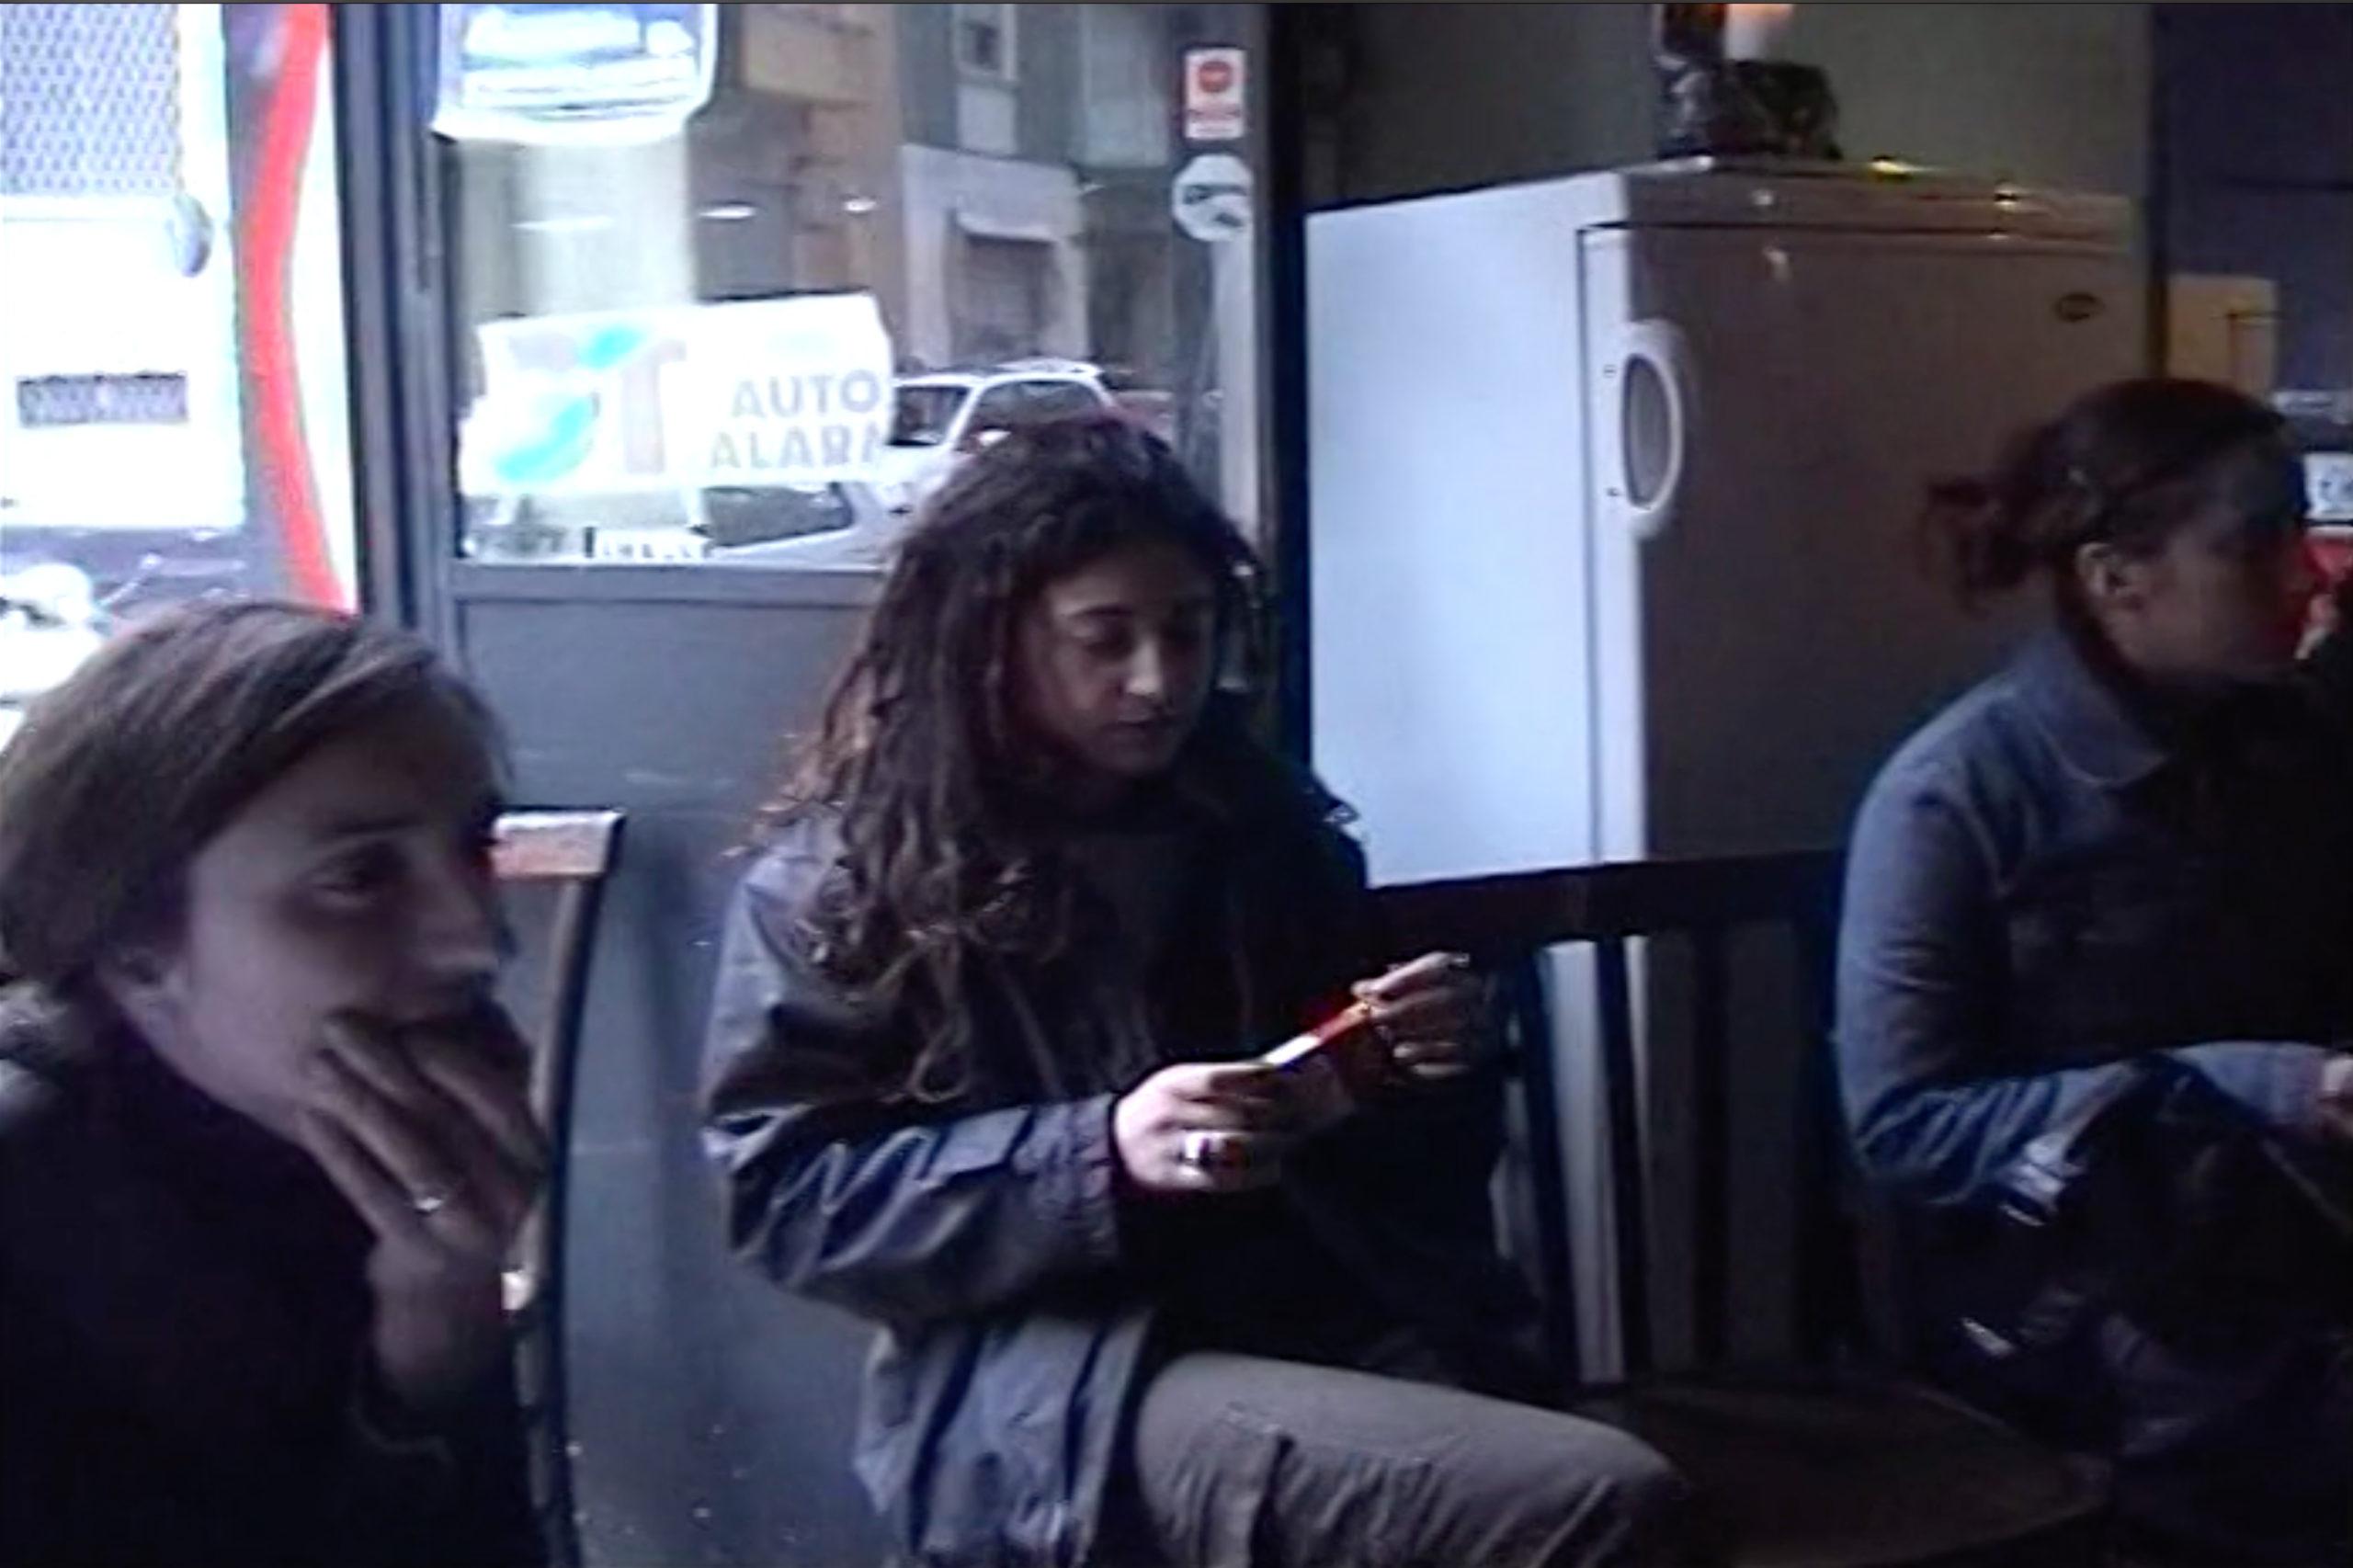 Lavinia Hanay Raja, occupazione femminista nata insieme al G8 di Genova